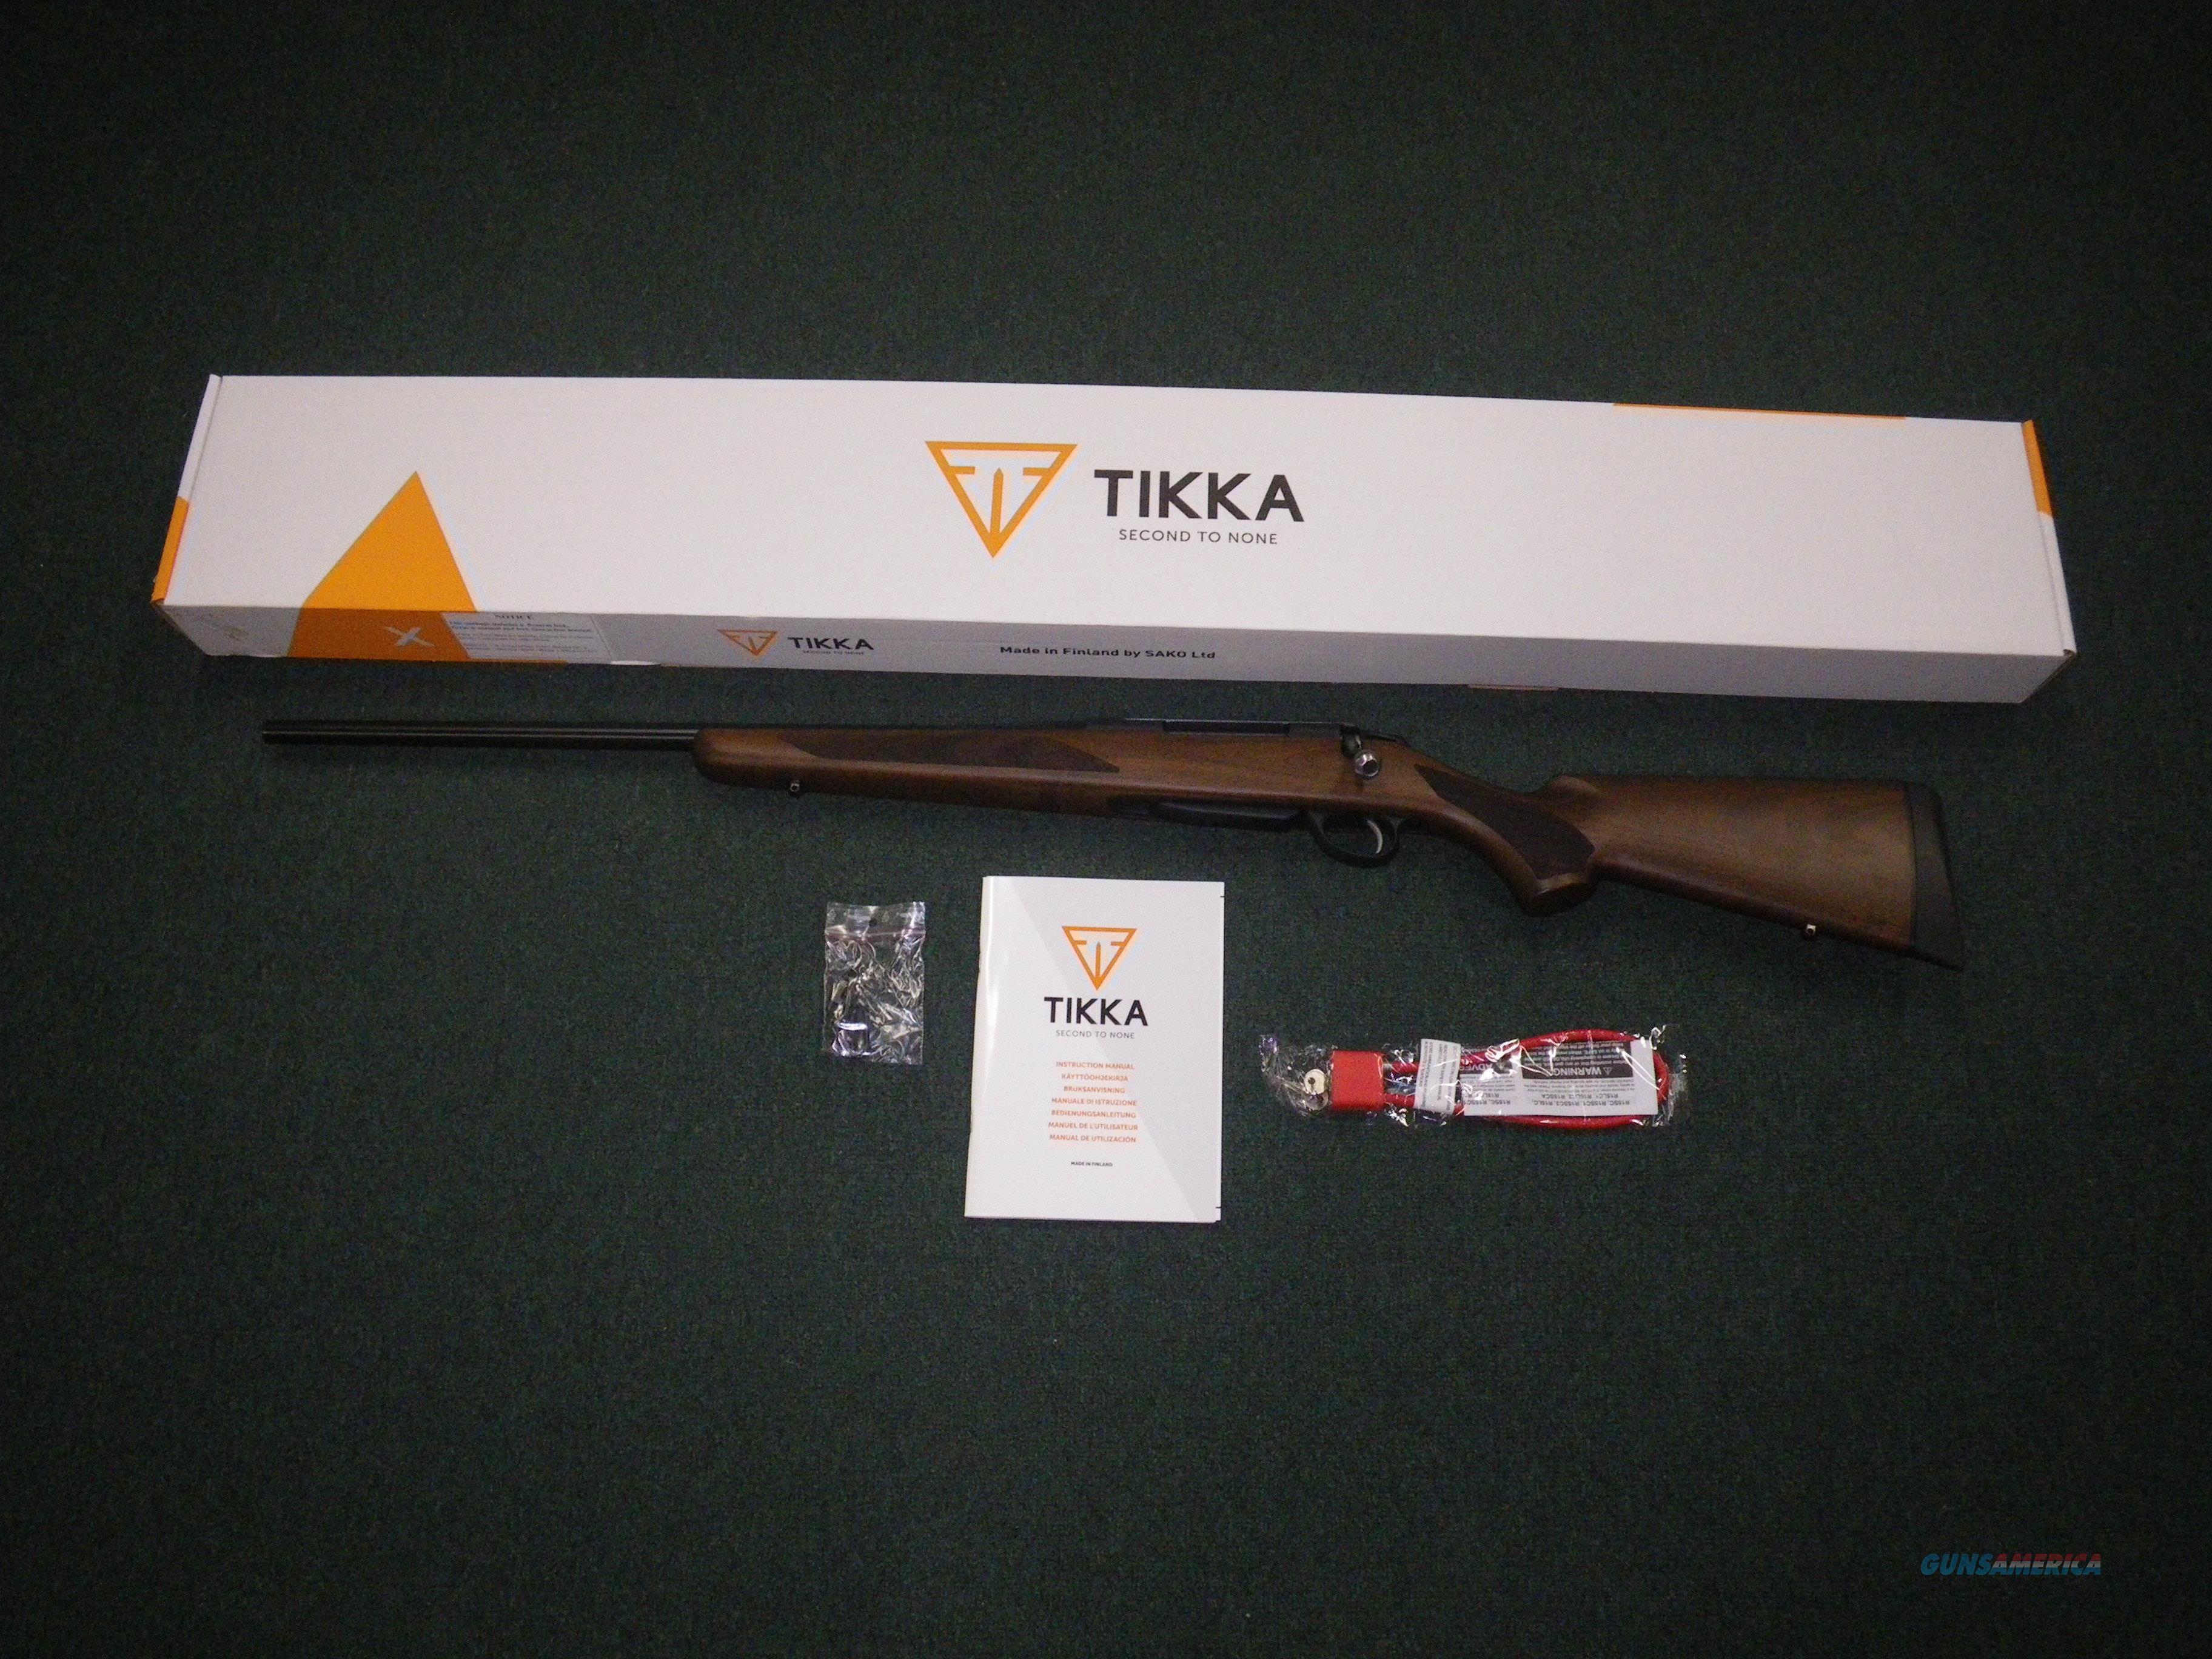 "Tikka T3x Hunter Left Hand 30-06 Spfld 22.4"" NEW JRTXA320L  Guns > Rifles > Tikka Rifles > T3"